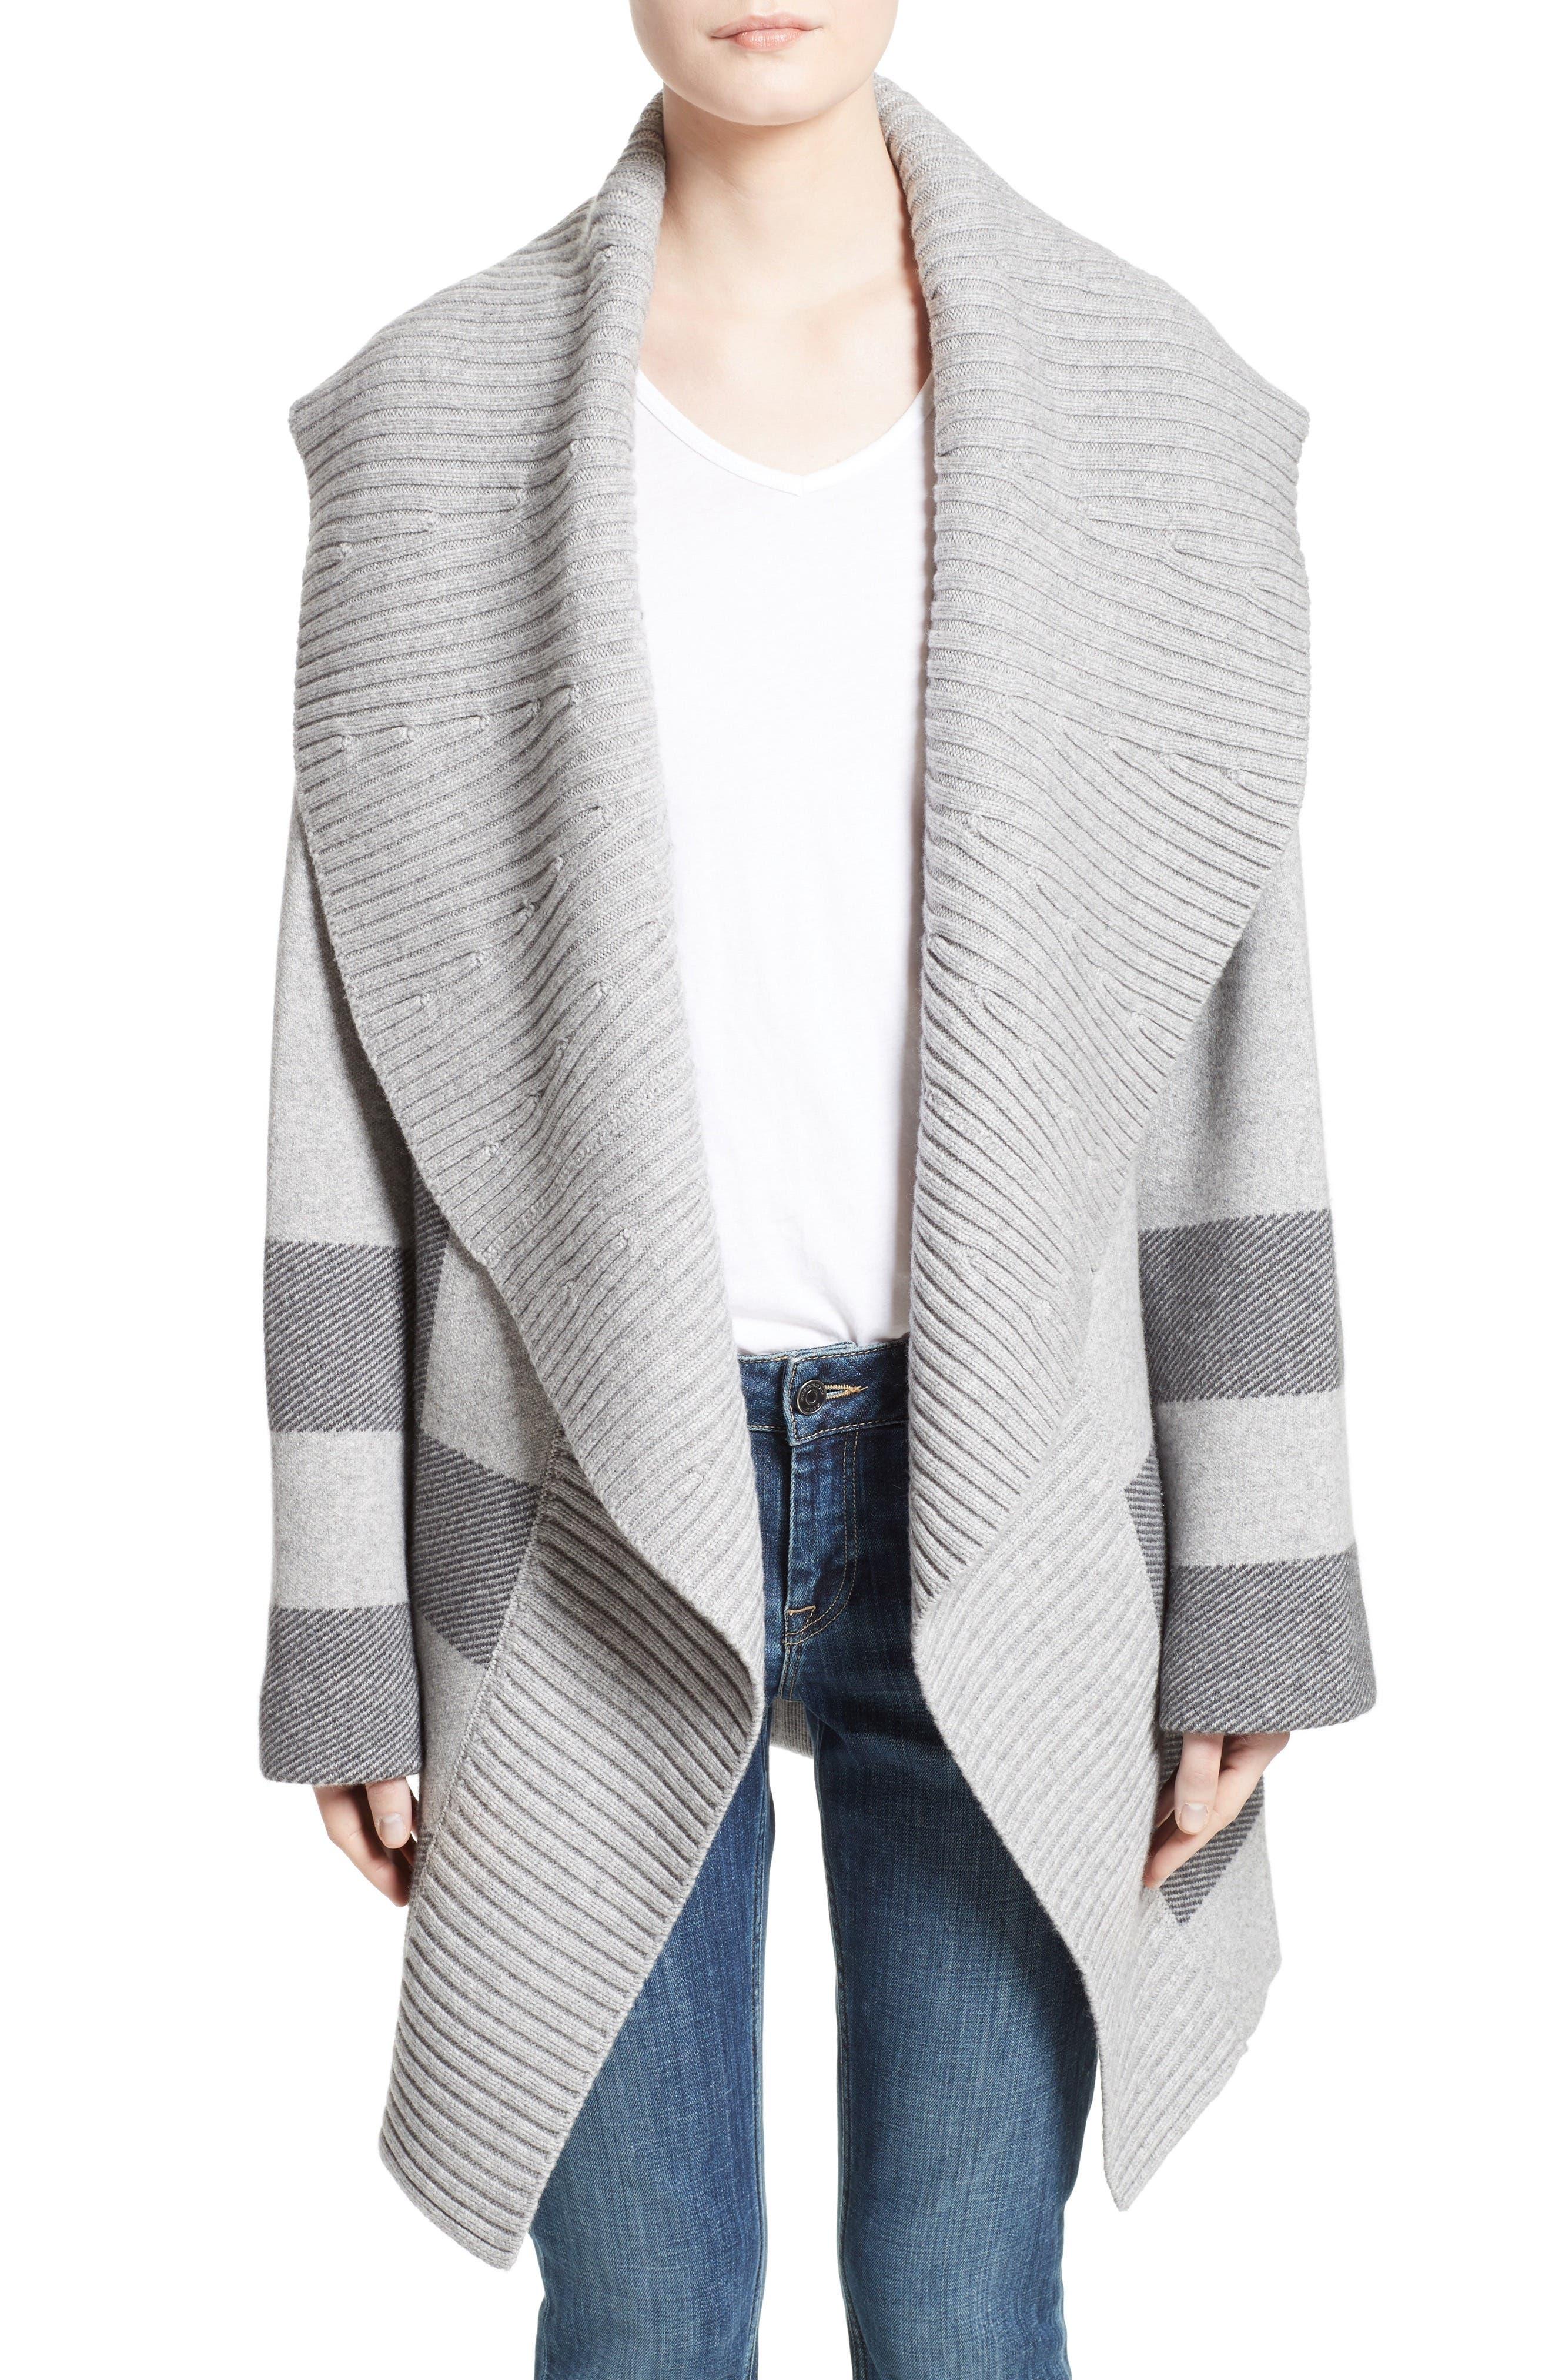 Gorlan Oversize Open Cardigan,                         Main,                         color, Pale Grey Melange